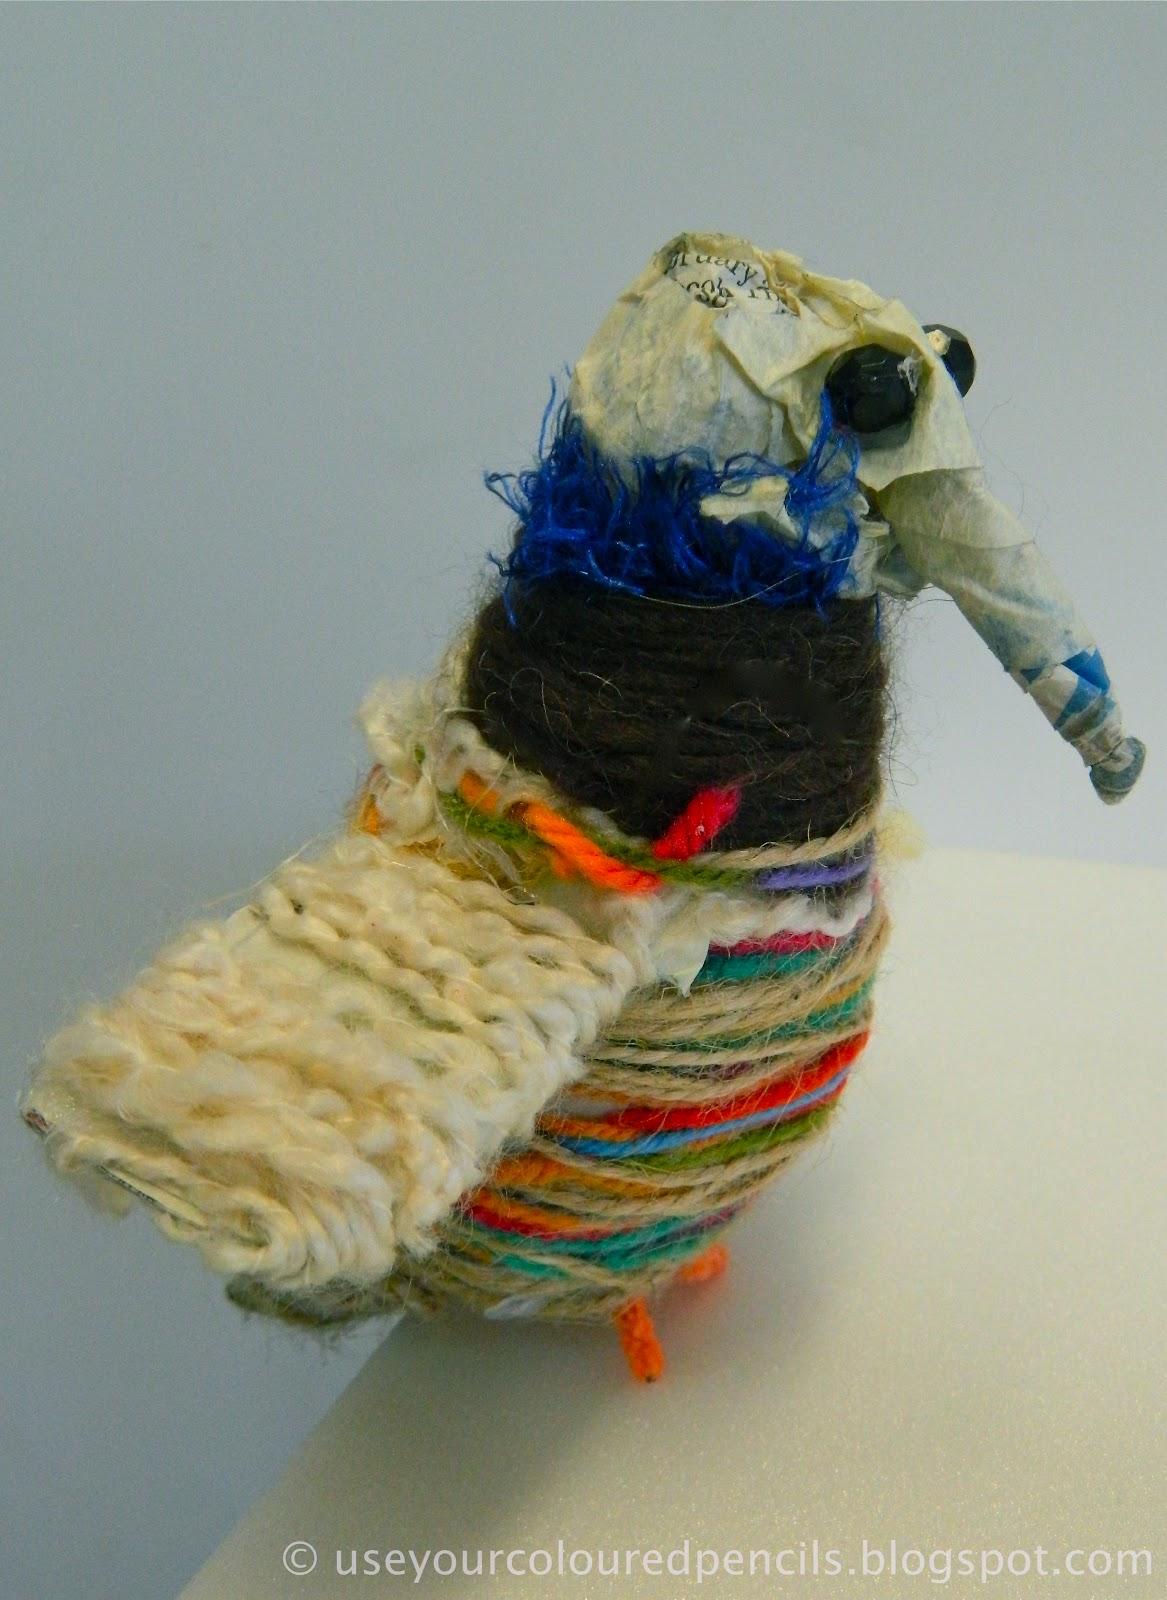 Use Your Coloured Pencils Aboriginal Inspired Fibre Sculptures